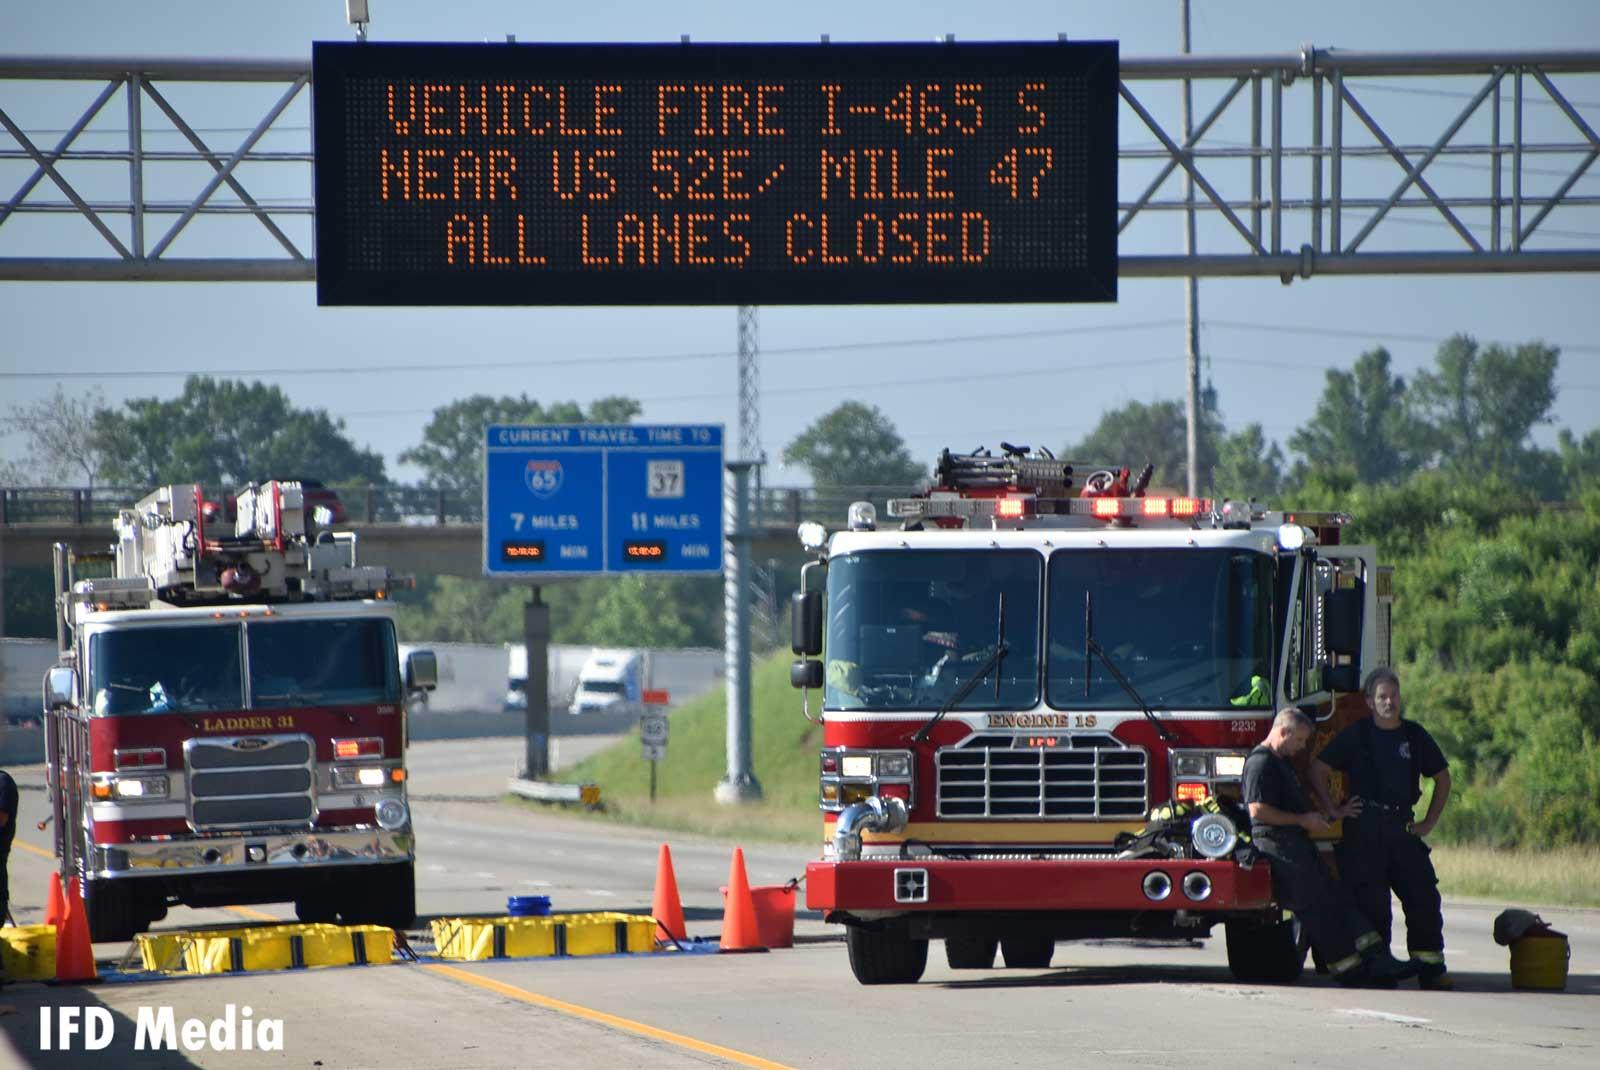 Fire trucks block the highway